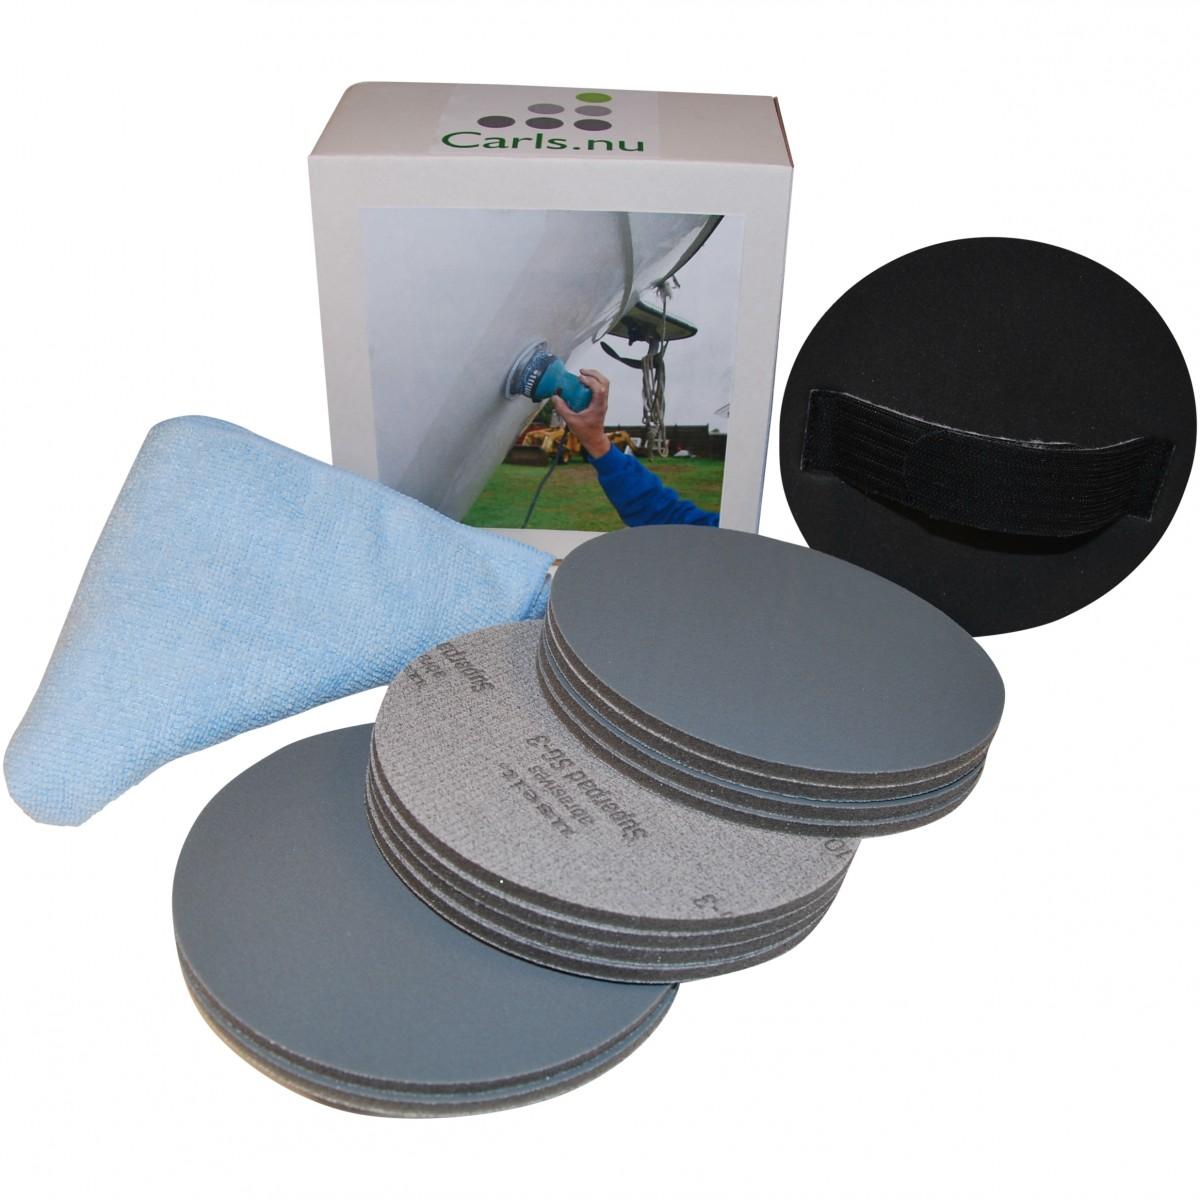 Carls Marine pre polishing kit